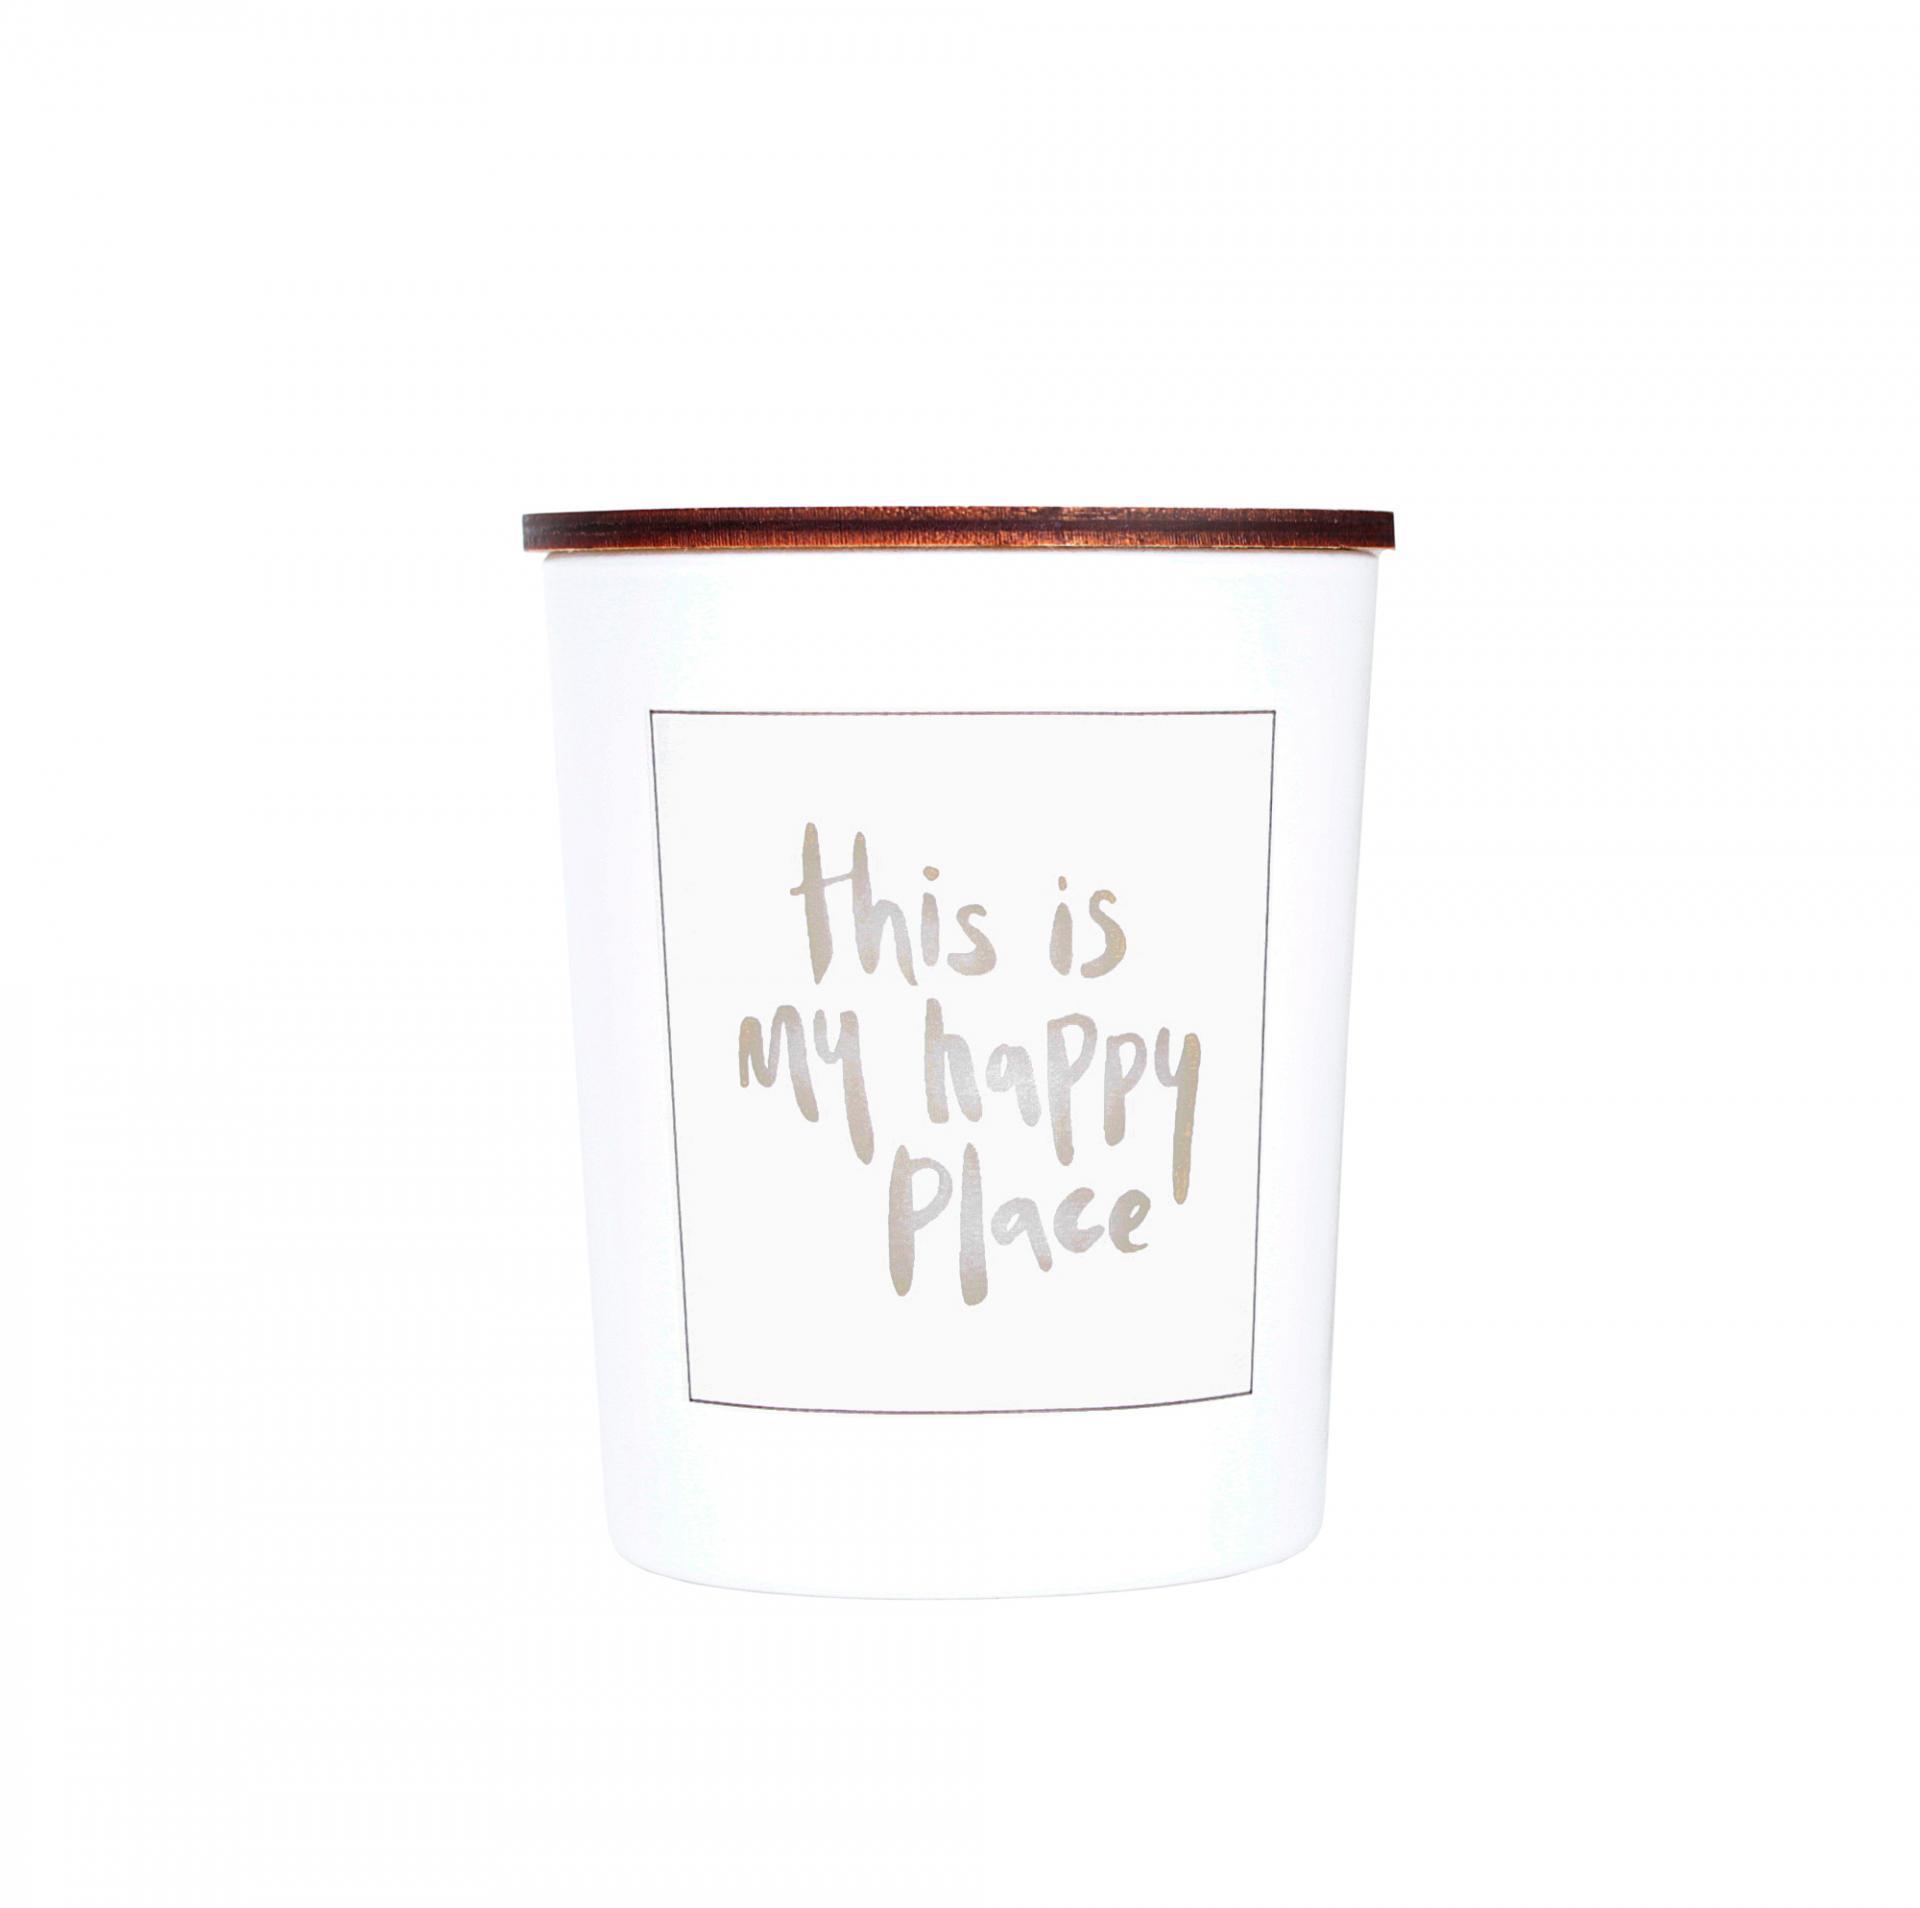 Love Inc. Bílá svíčka Happy place - fíky a růže, bílá barva, sklo, dřevo, vosk